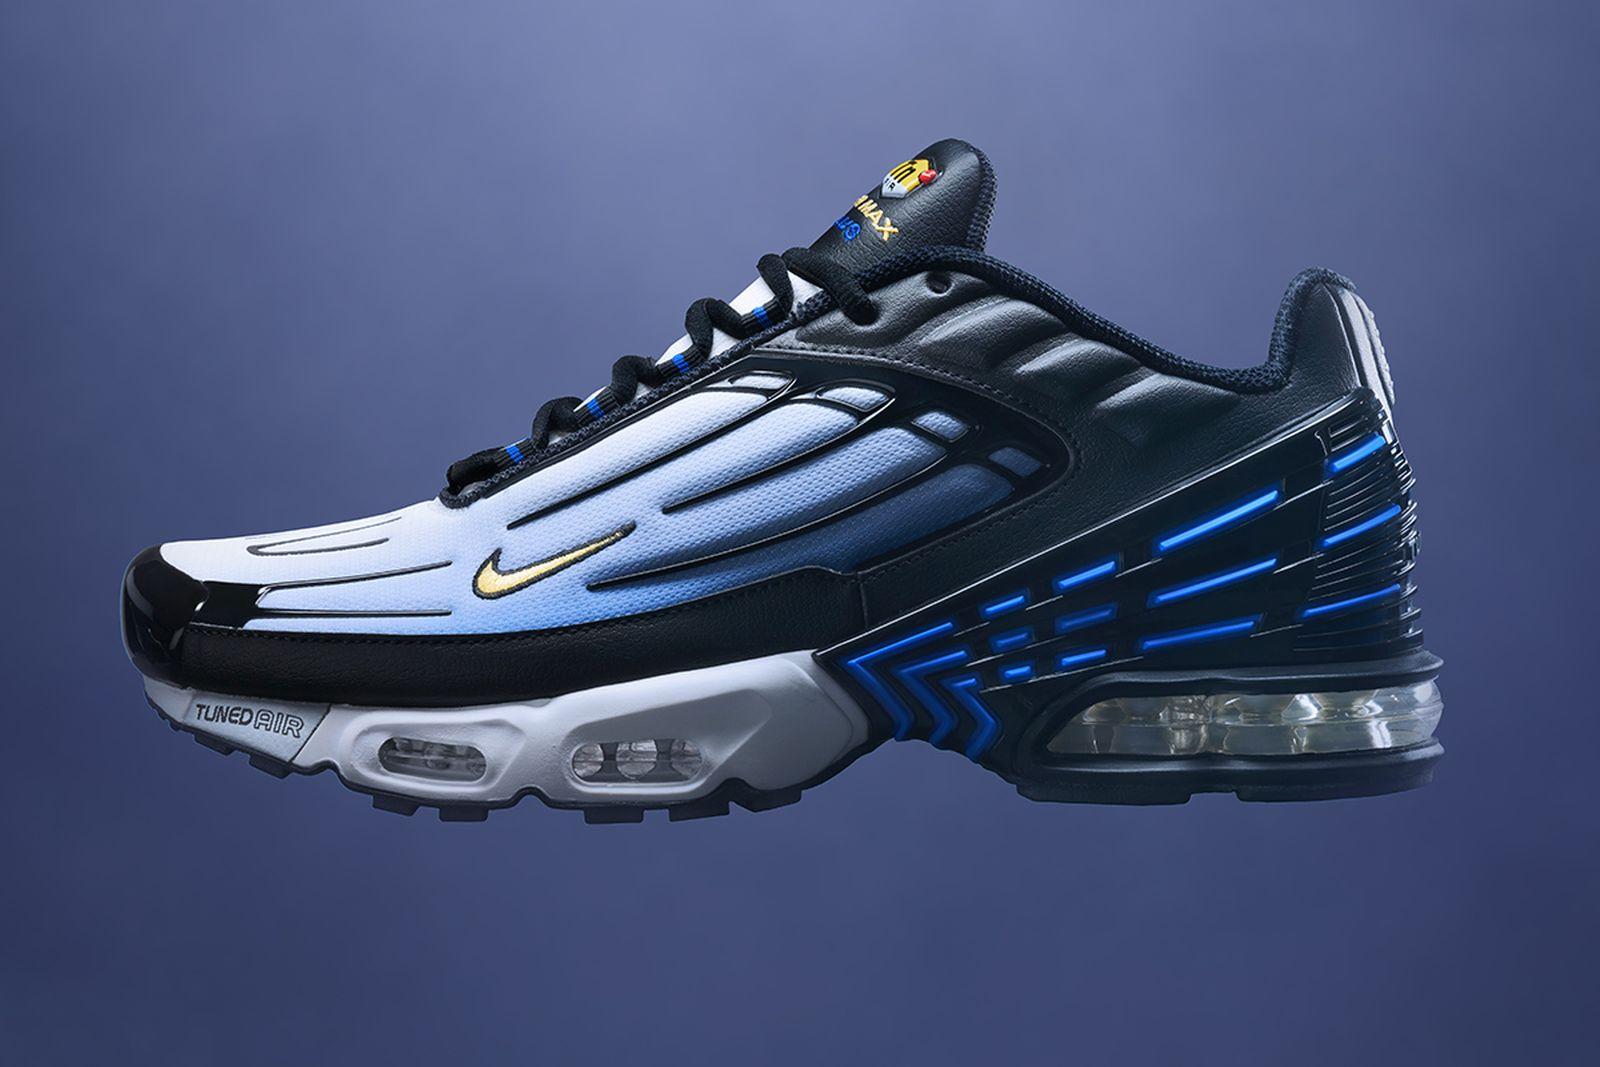 Foot Locker Drops Nike Air Max Plus 3 in OG Colorway